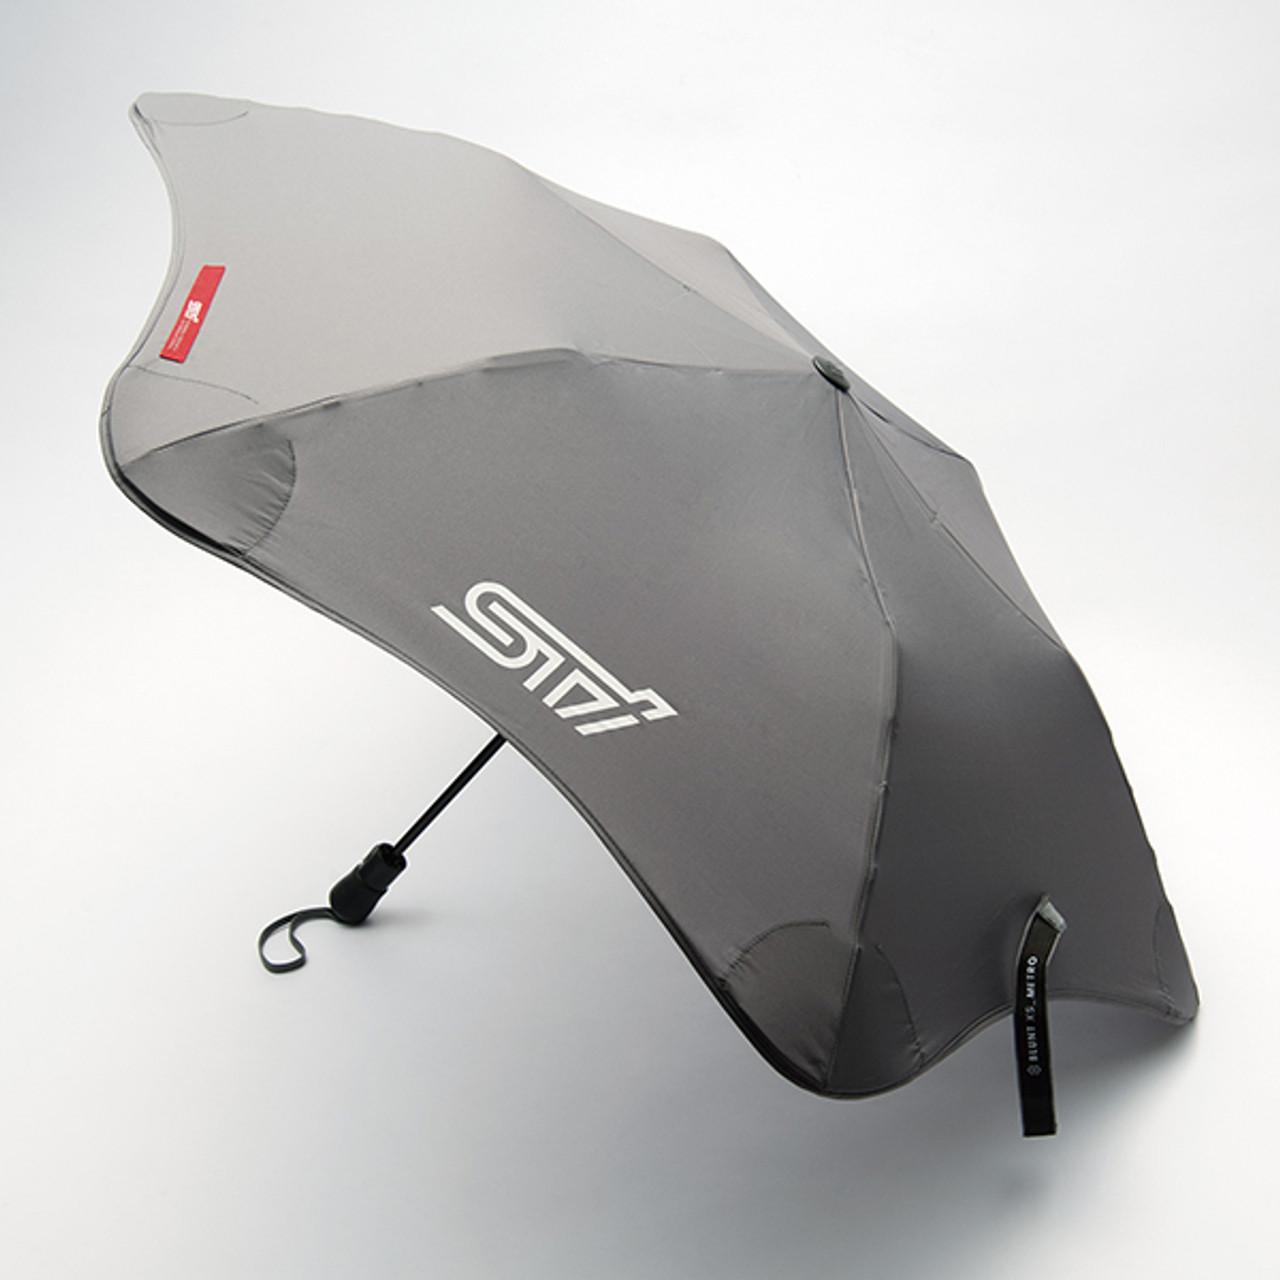 STI Folding Umbrella at AVOJDM.com